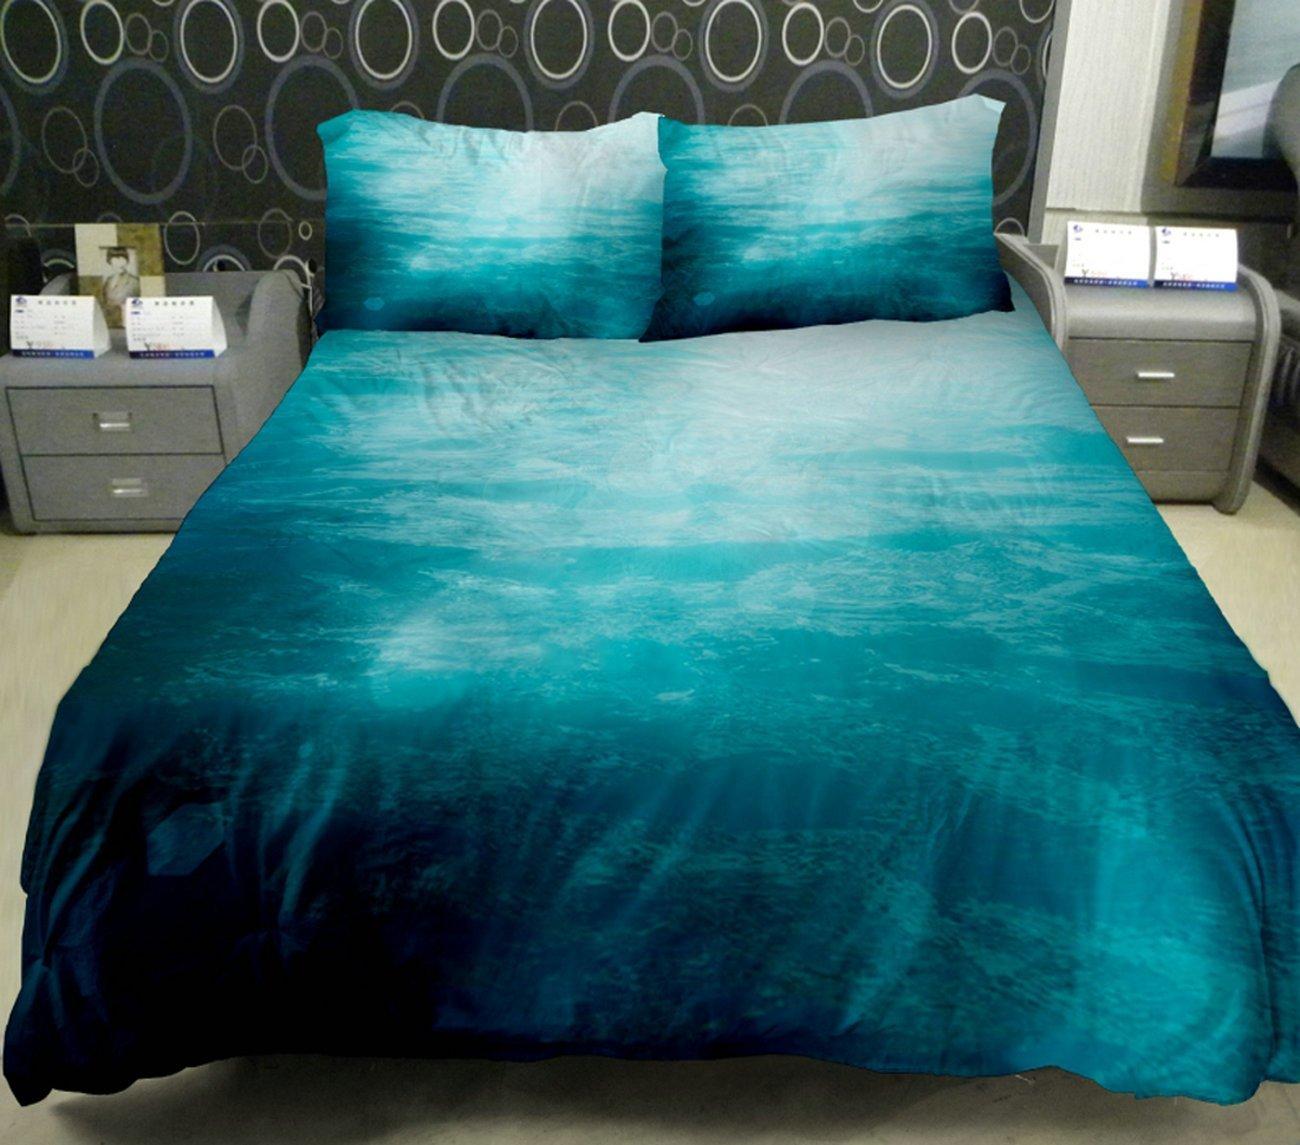 Anlyeシーツカバーセット さざ波を立ちている淡いブルーの海 エコシリーズ 3D捺染 枕カバー2枚  掛け布団カバー フラットシーツ フルサイズ B00KEMW29Q フル(228X198 CM) フル(228X198 CM)